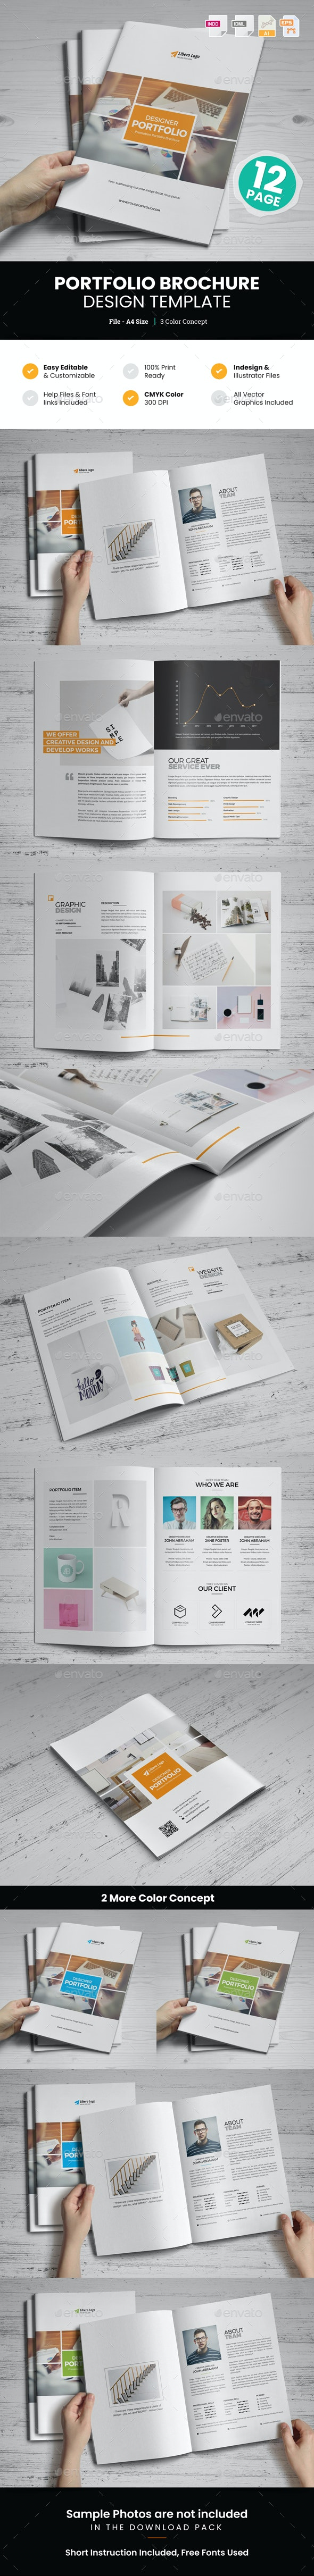 Portfolio Brochure Design v5 - Corporate Brochures